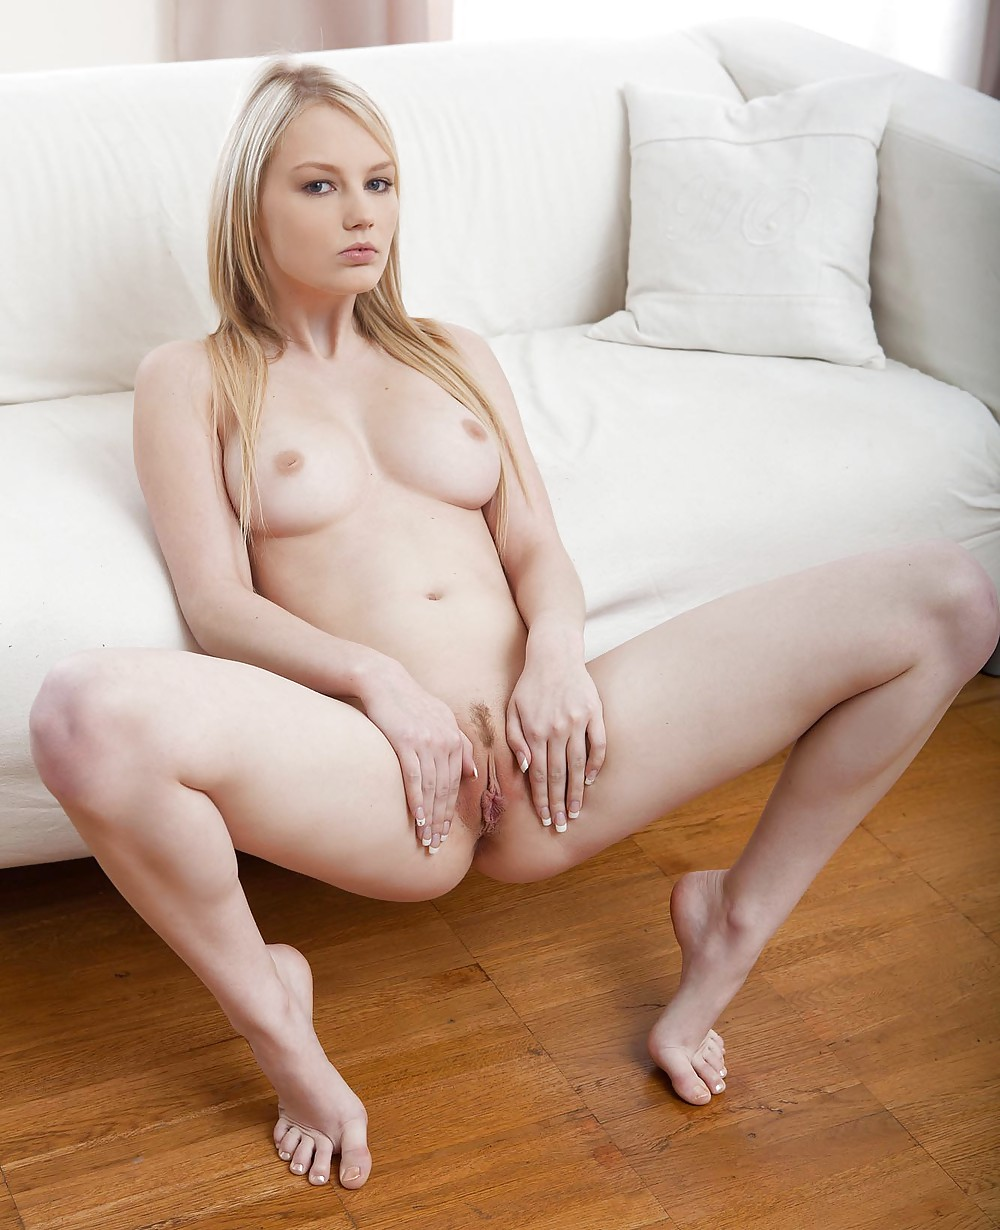 Sarka porn pic